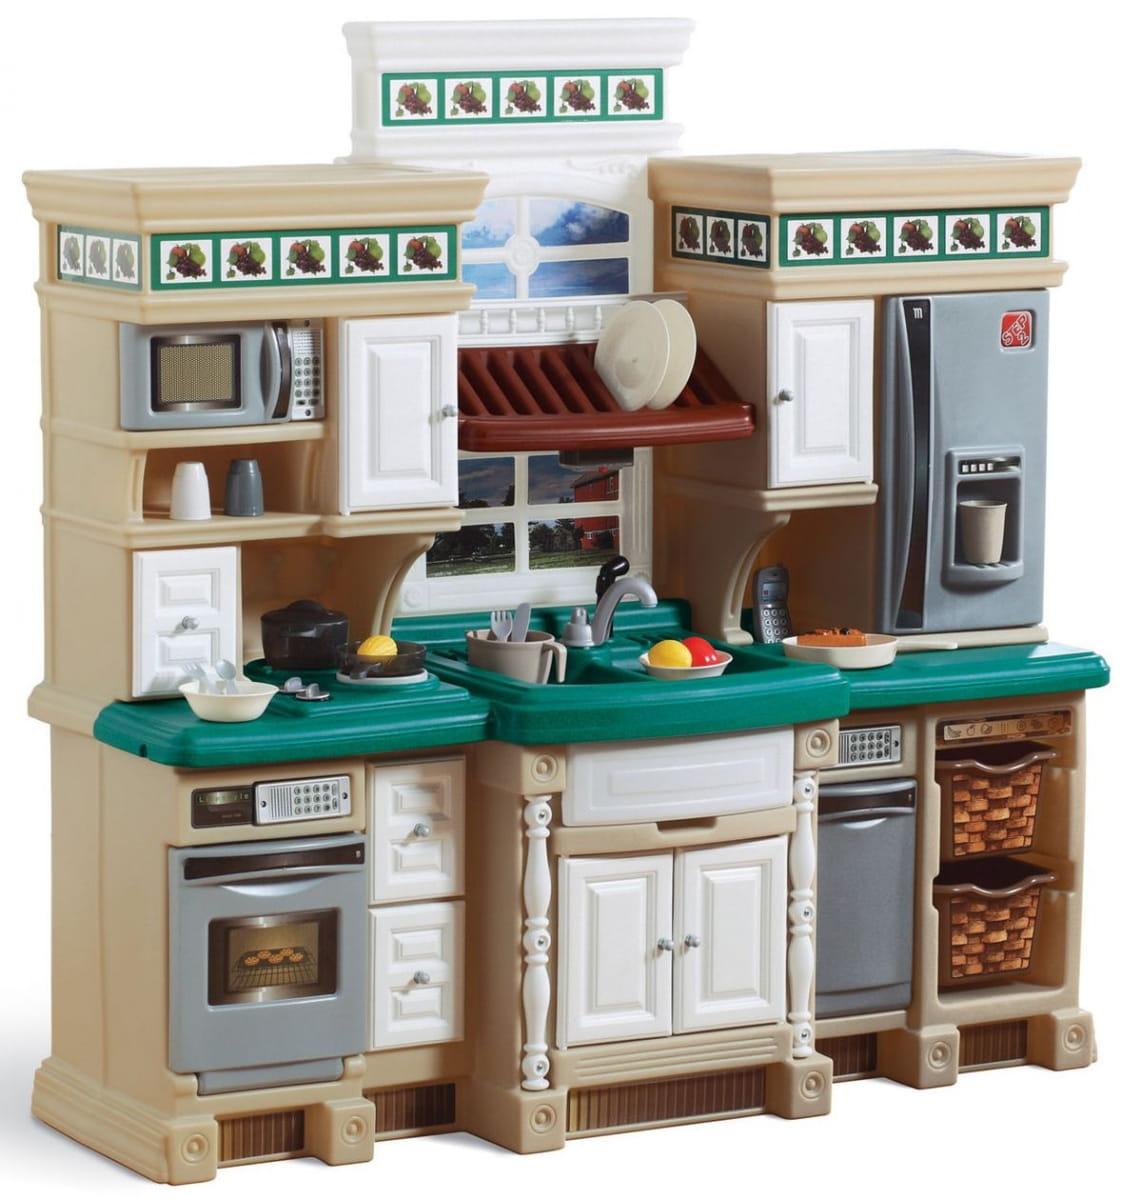 Детская кухня STEP2 Люкс